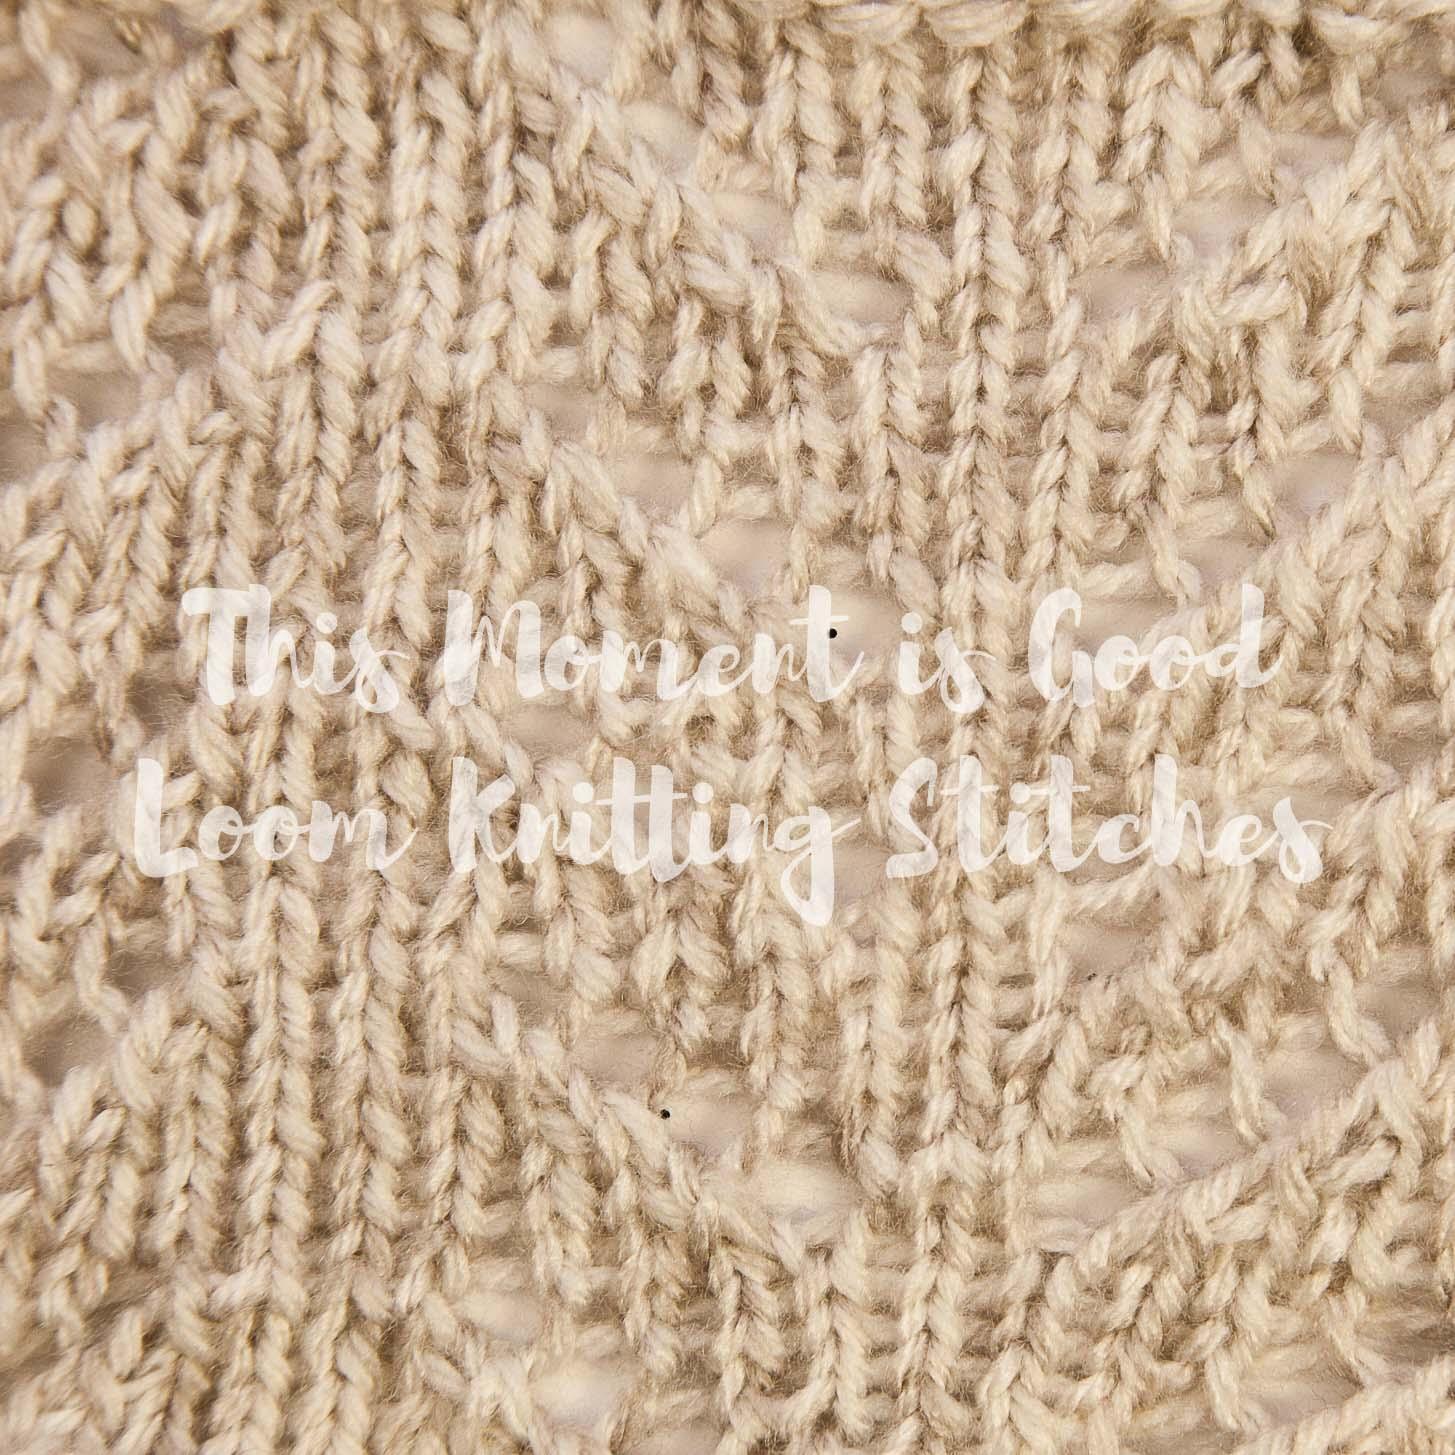 da97b1aa1d26f0 overlapping waves knitting stitch patterns most popular 467e6 86d5a ...